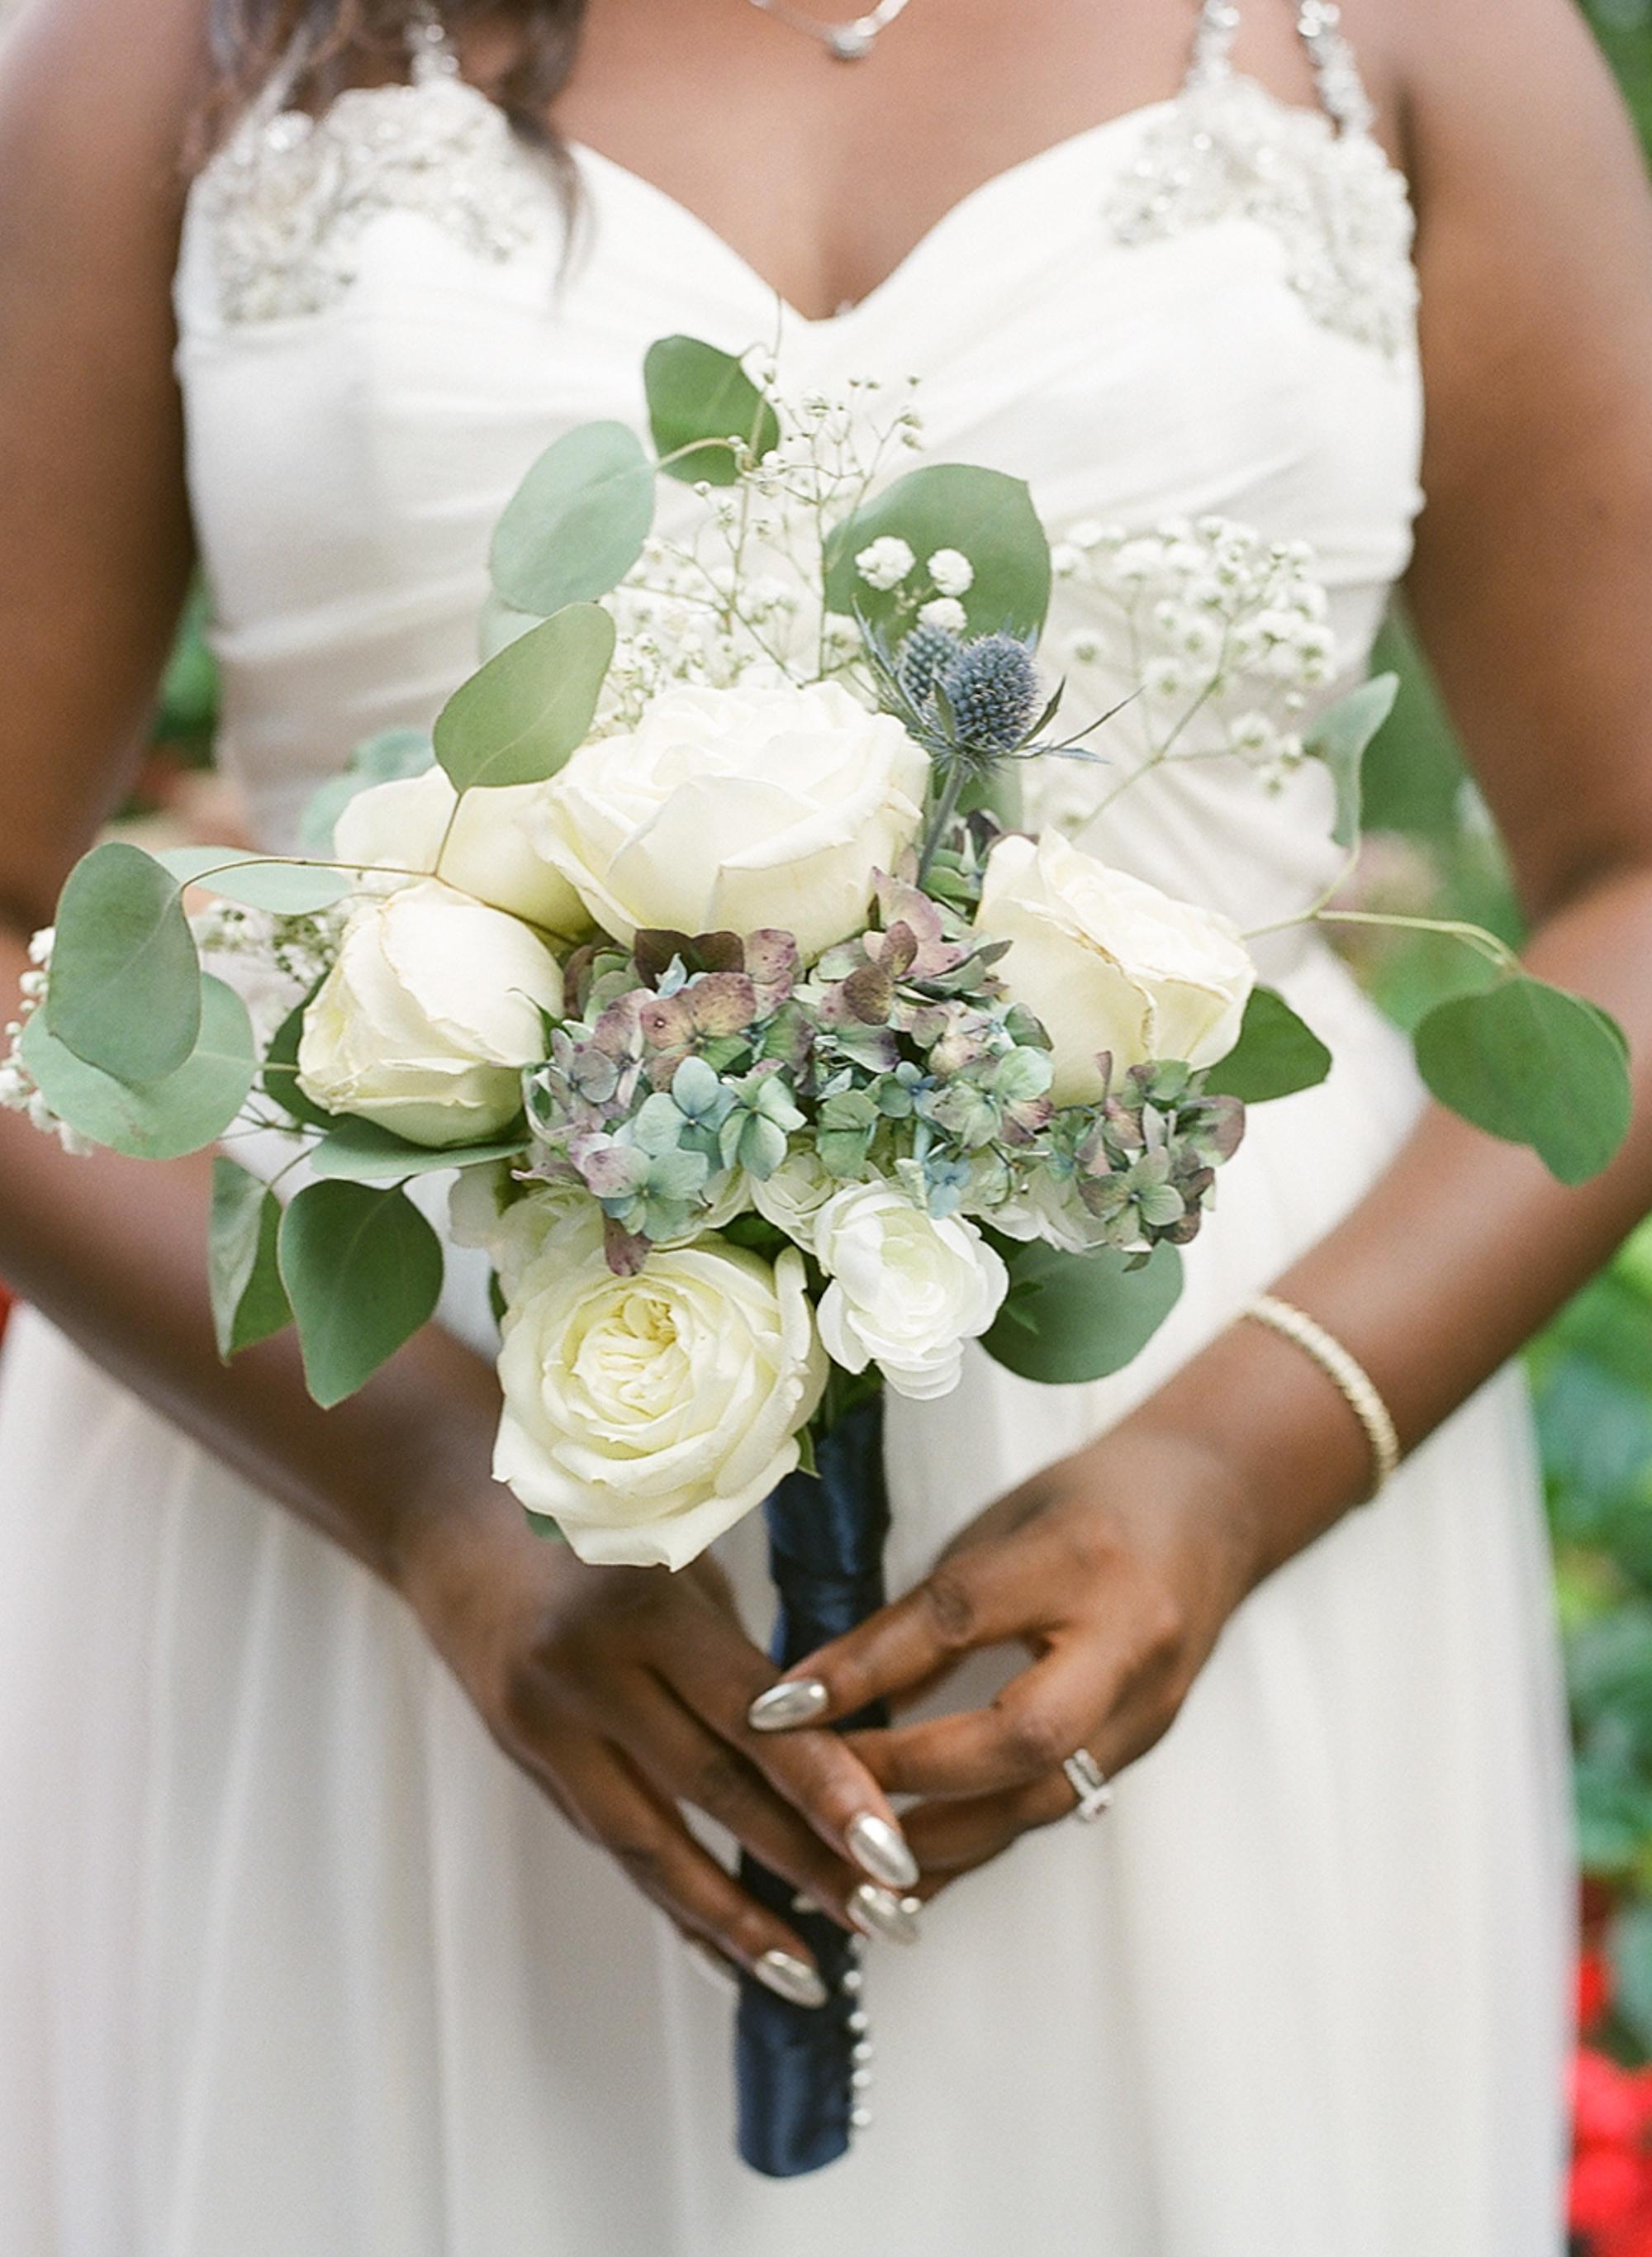 BonpBonphotage Chicago Fine Art Wedding Photography - Galleria Marchetti